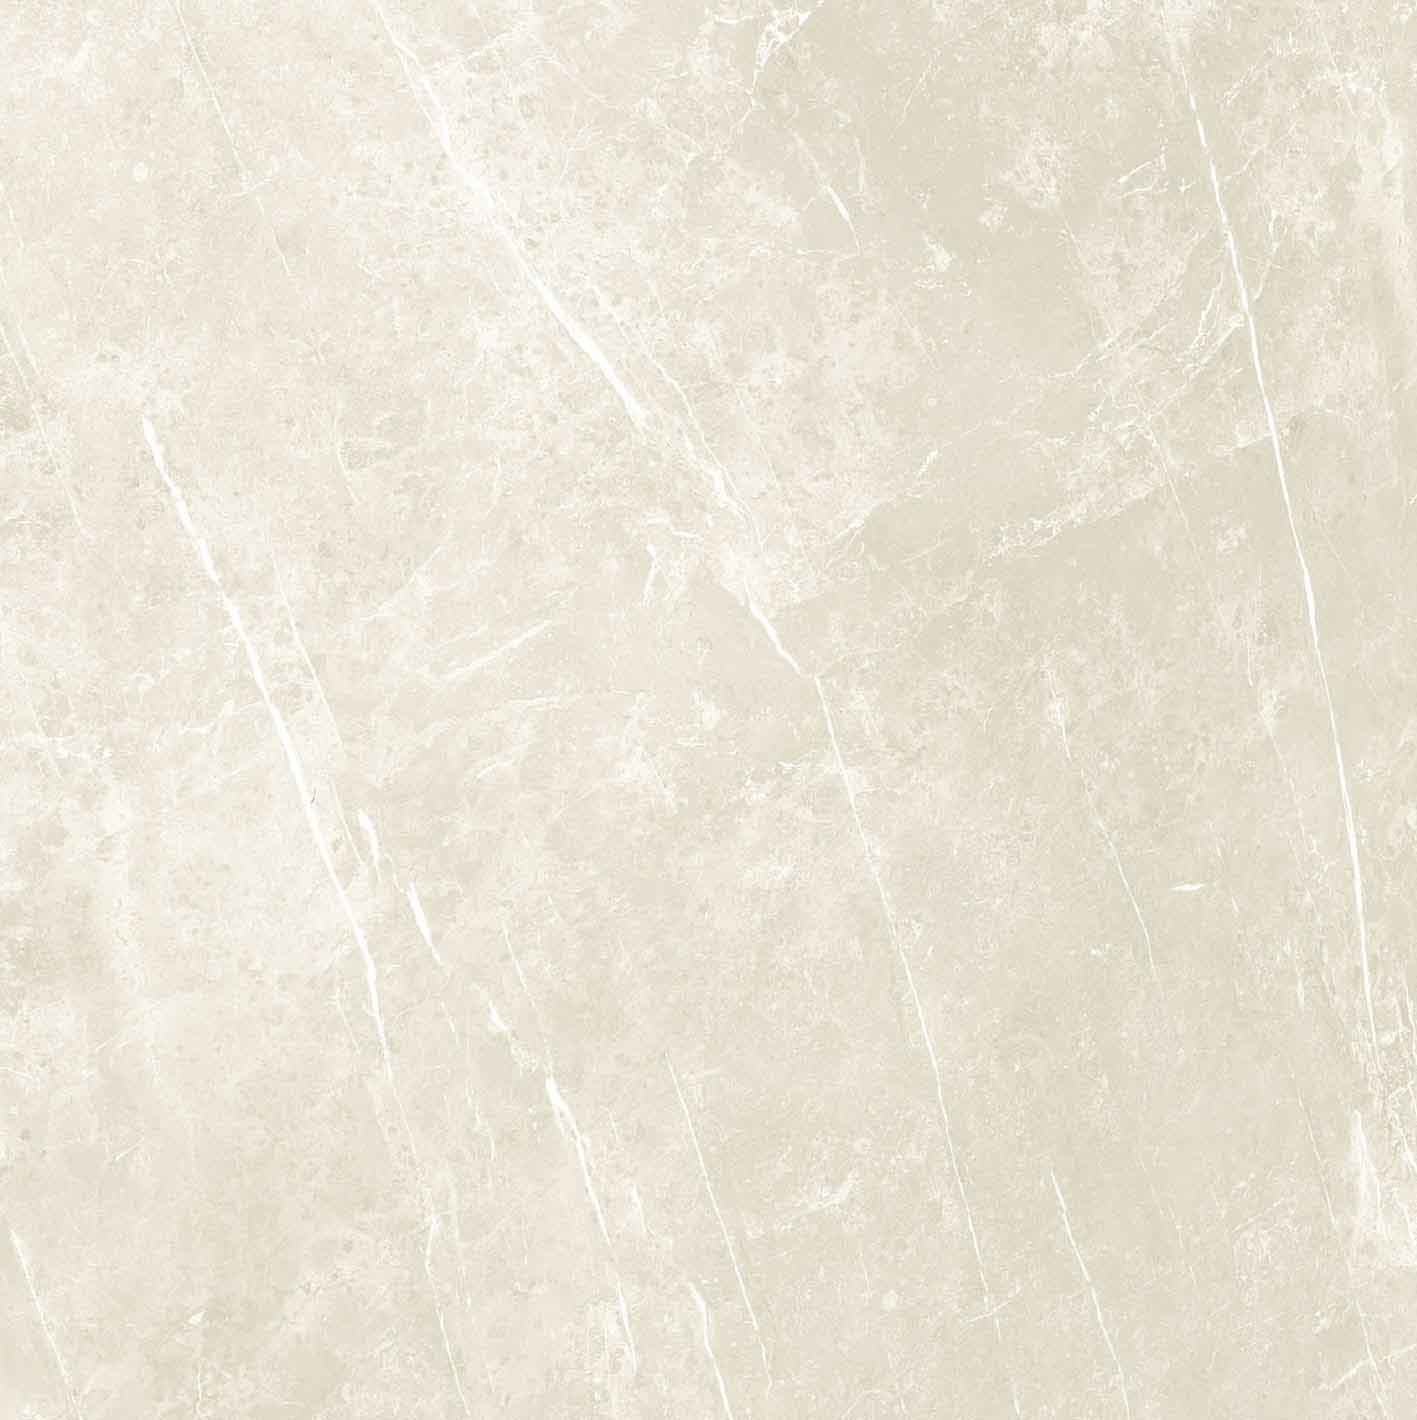 Elemental Stone Cream Dolomia Matte 10mm 120 x 120